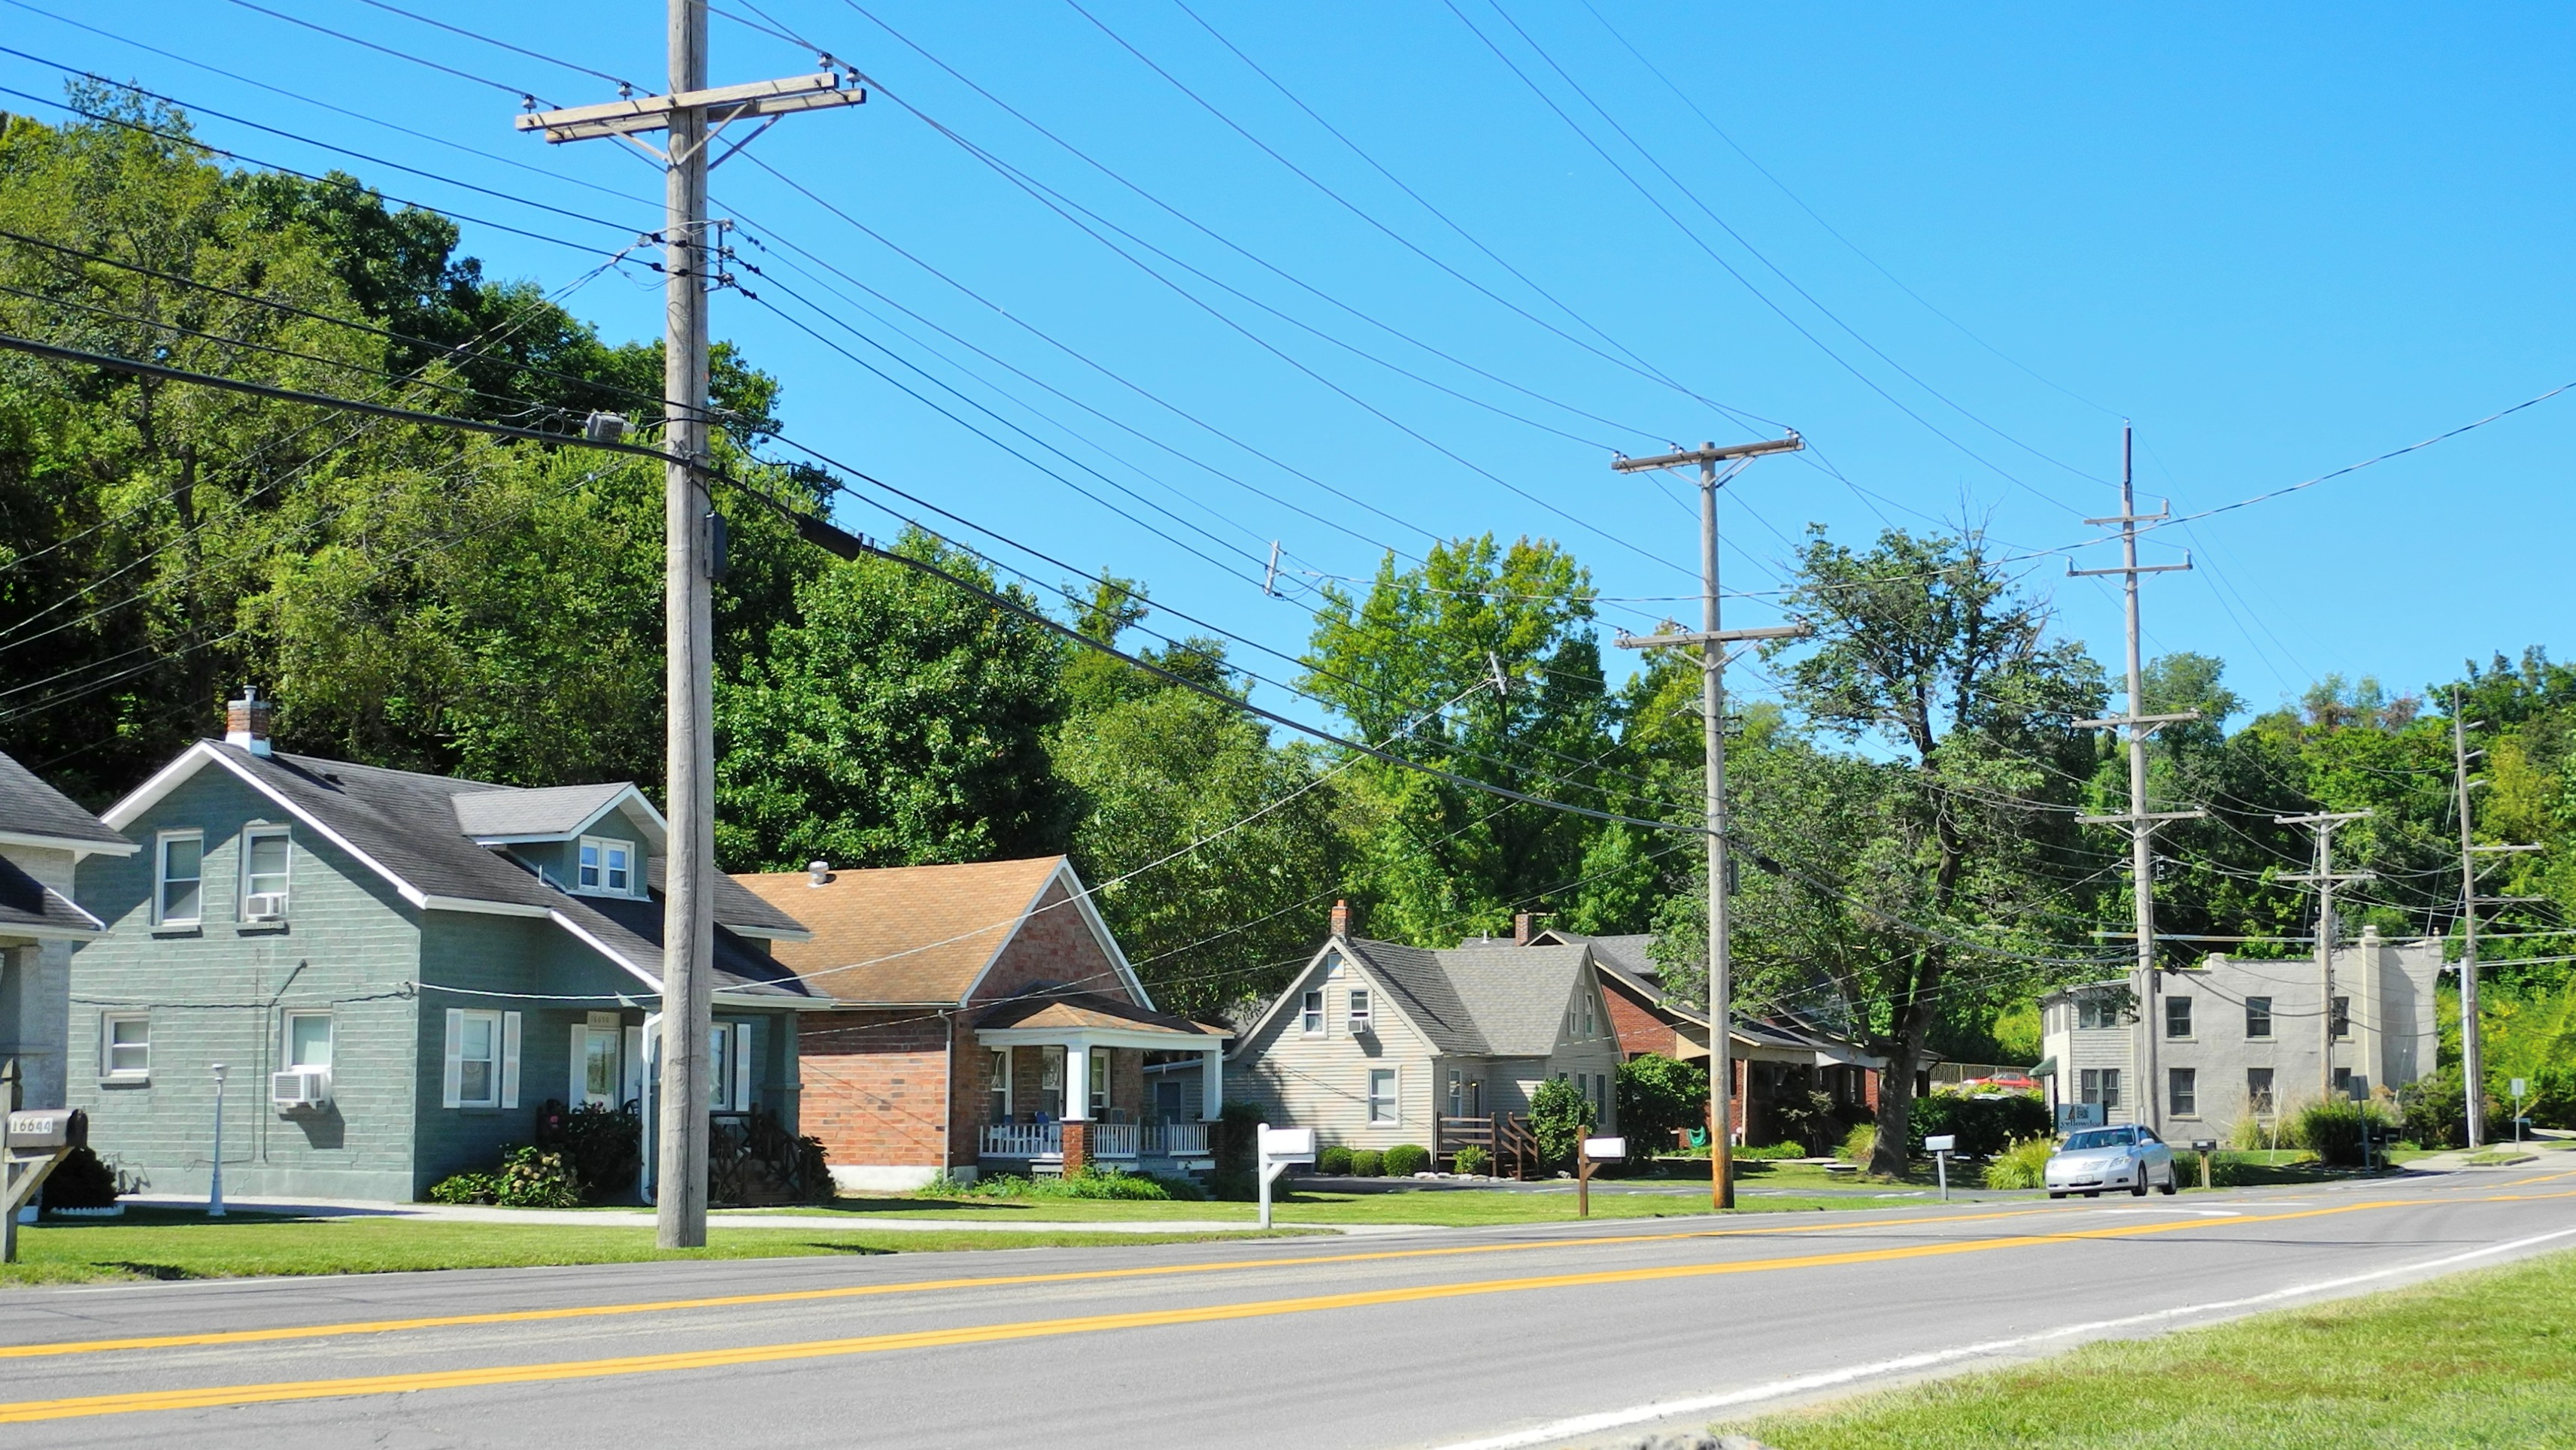 File:Old Chesterfield, Missouri.JPG - Wikimedia Commons